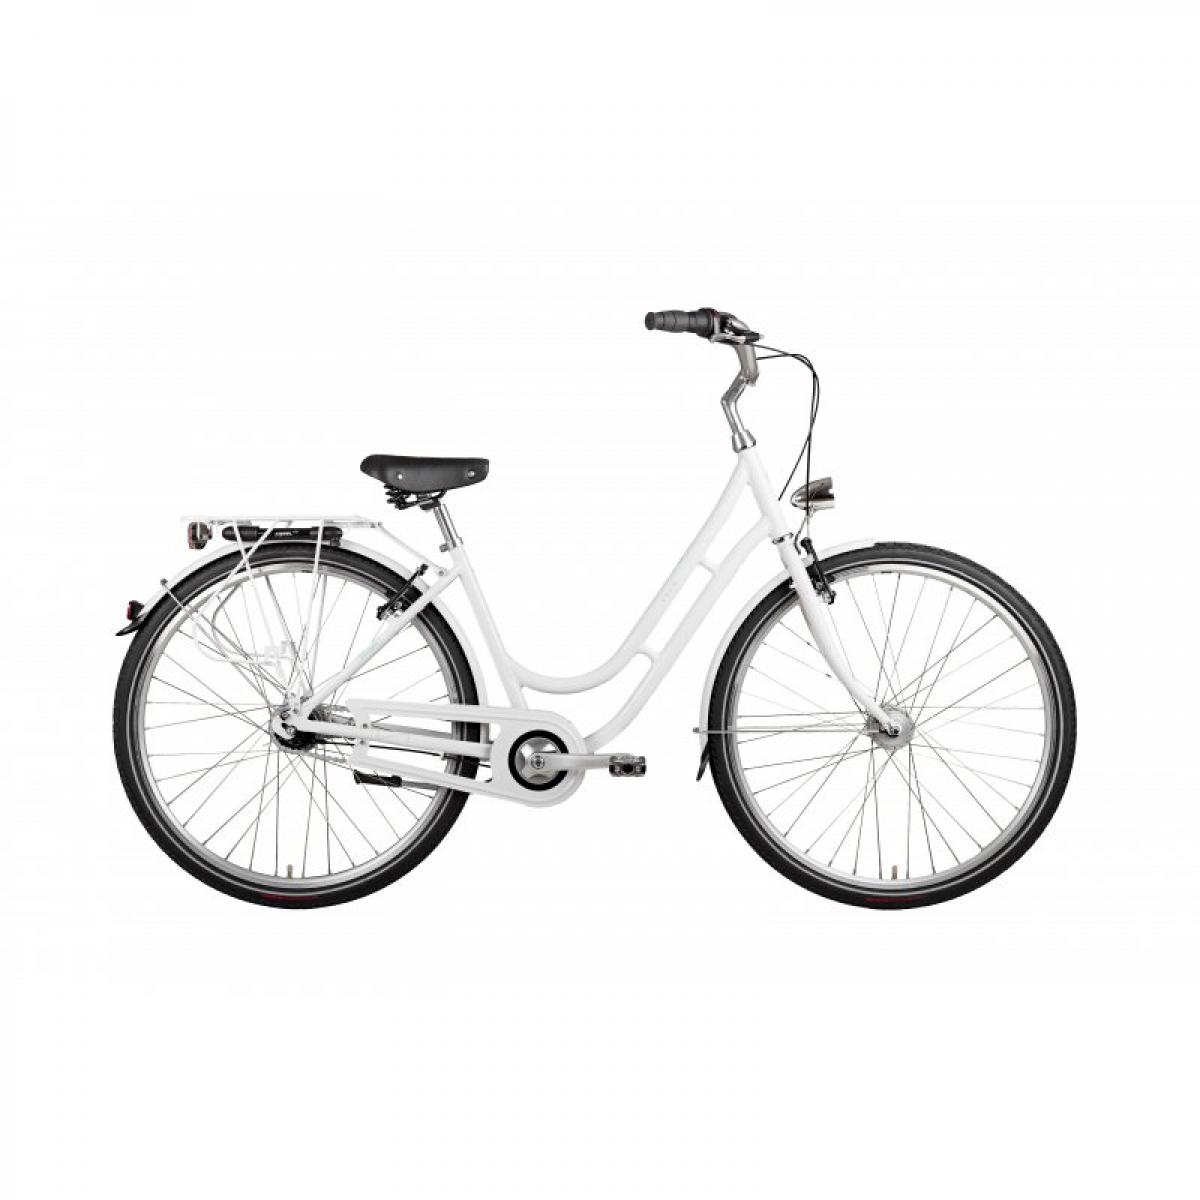 28 zoll alu vaun damen city fahrrad city bike shimano. Black Bedroom Furniture Sets. Home Design Ideas